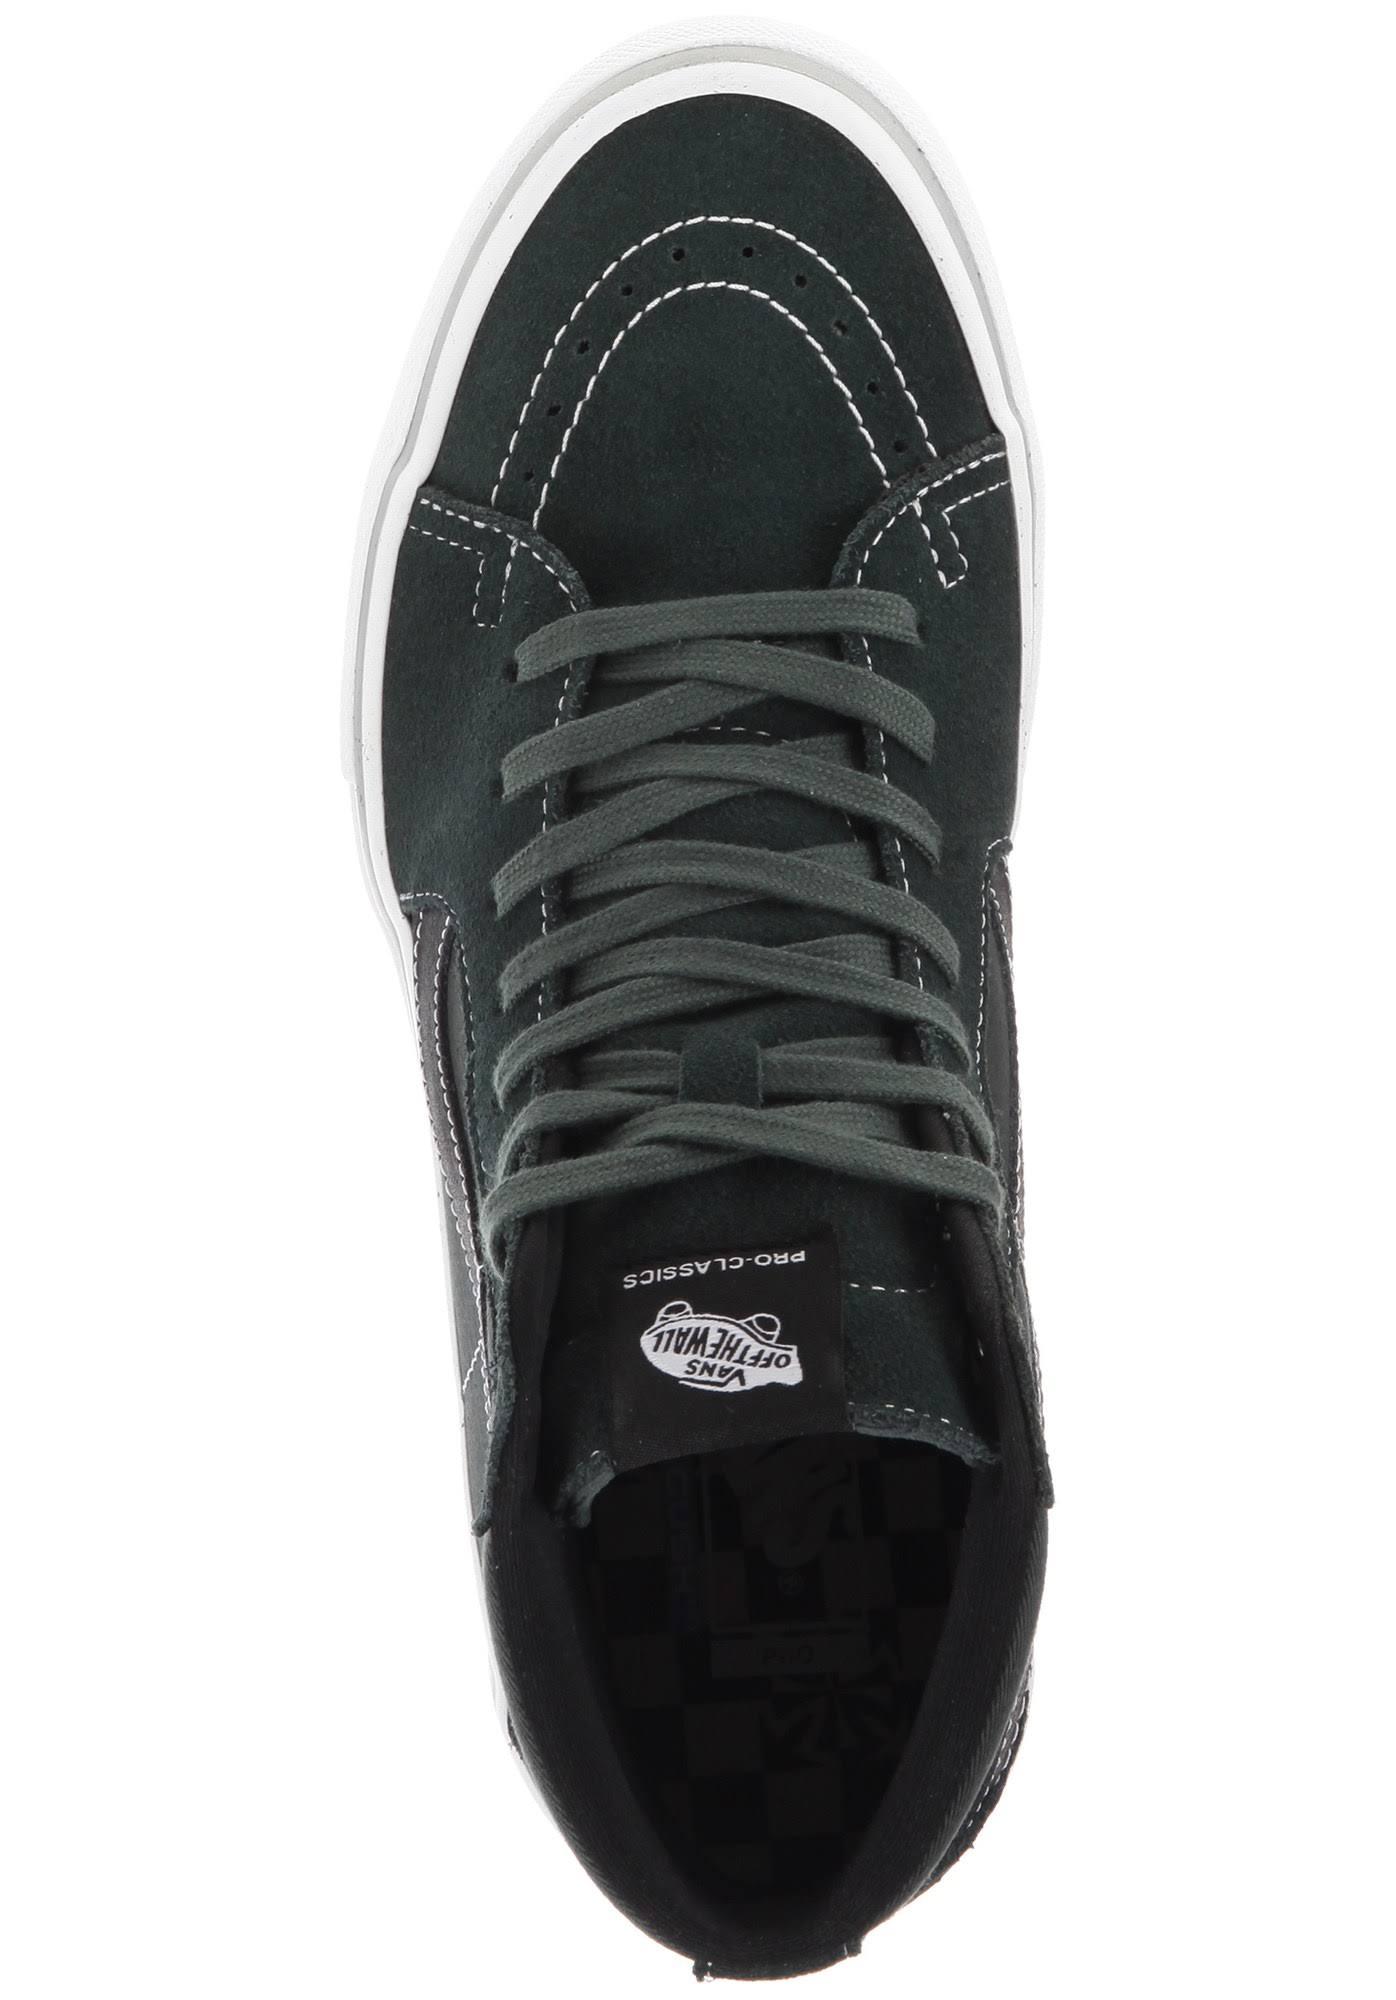 Schuhe 42 Independent Pro Größe Vn000vhgu241 Sk8hi Vans X Grün dwBxq01dO